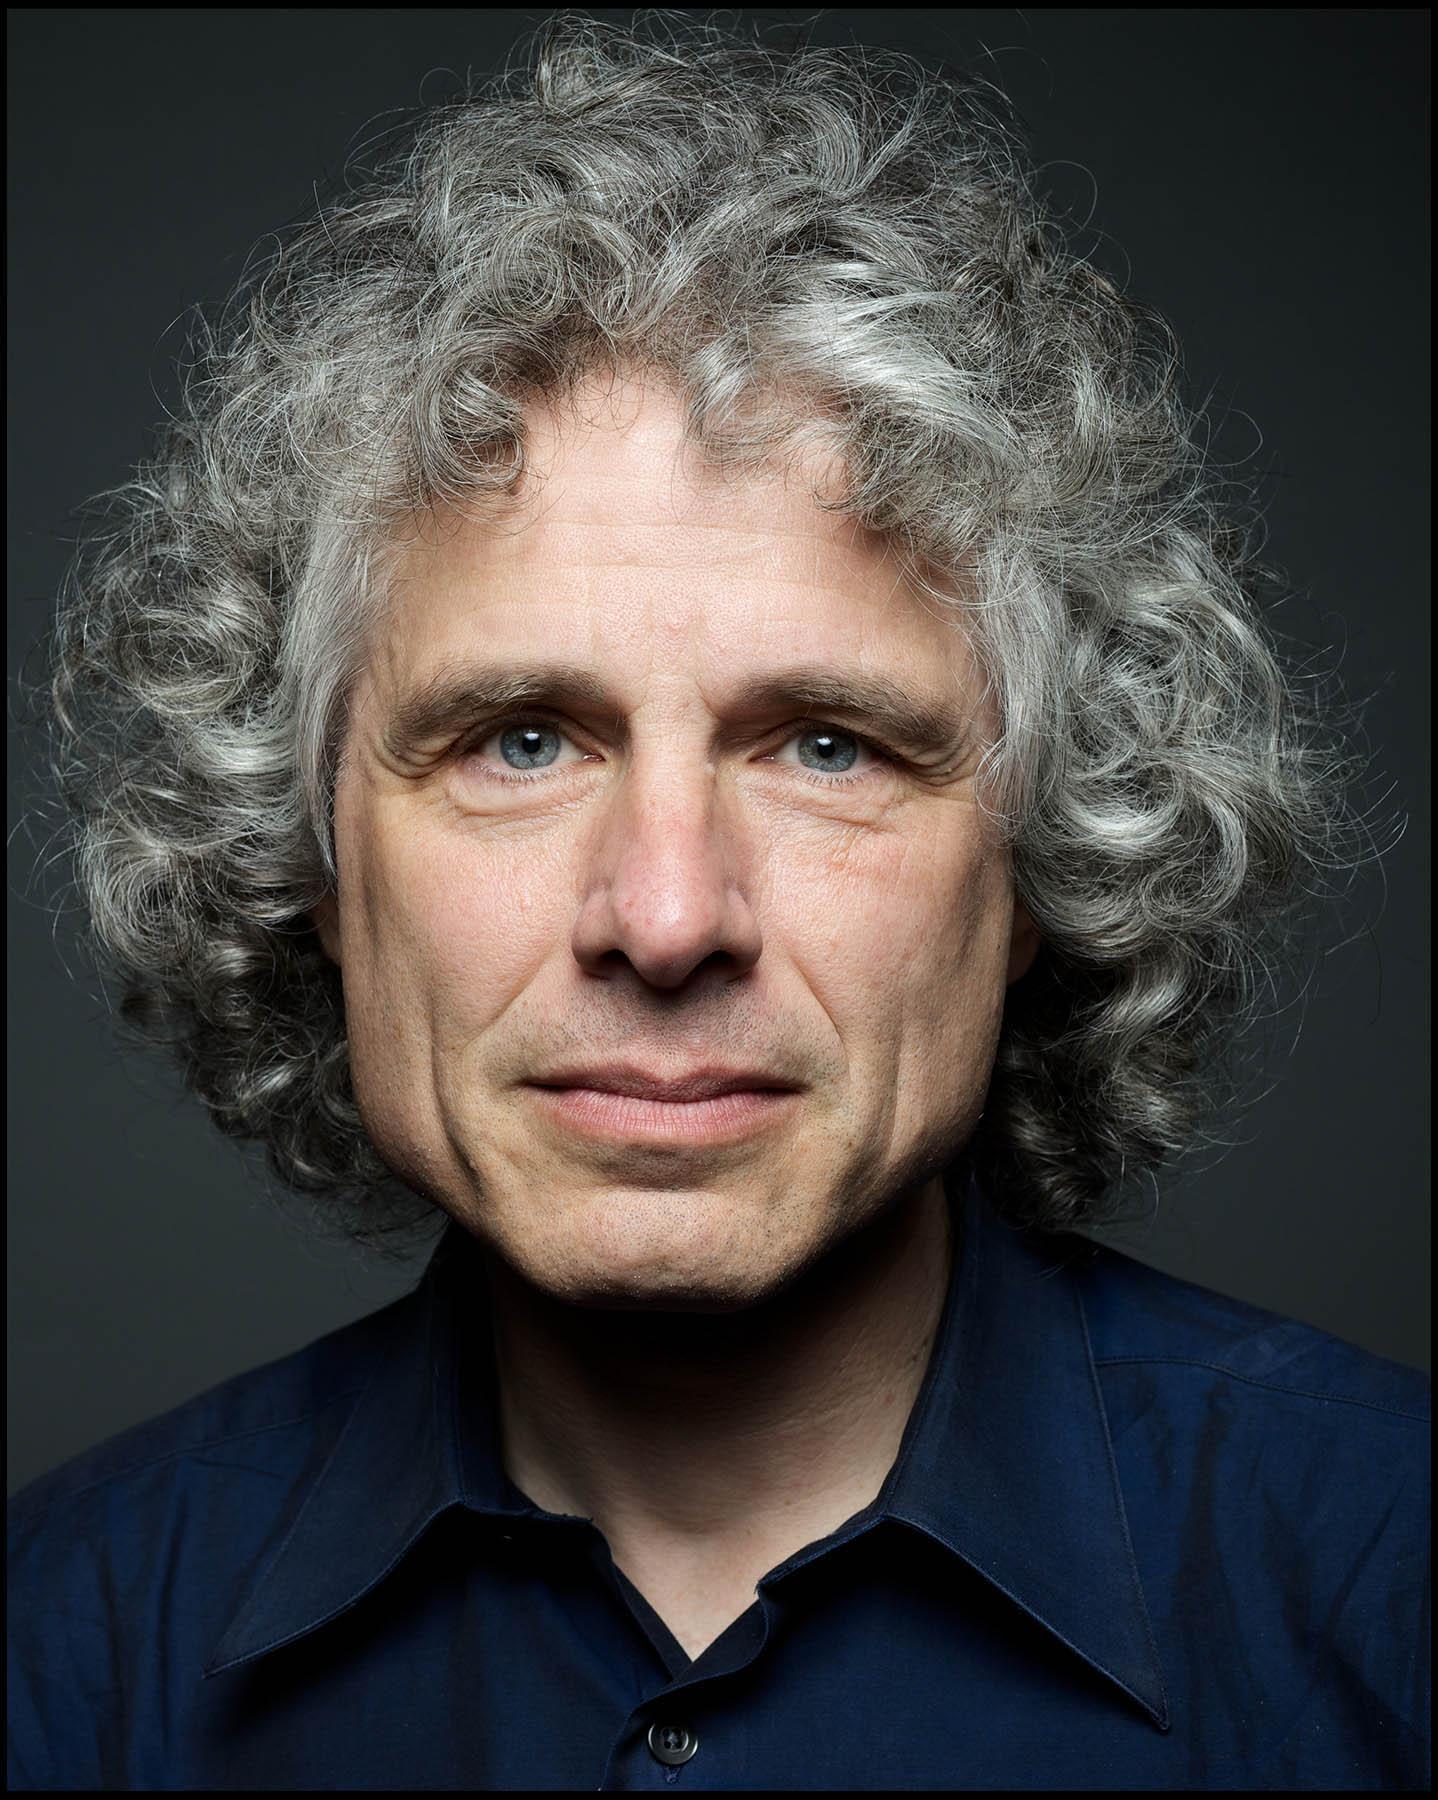 Steven Pinker (Foto: Max S. Gerber.  Hentet fra www.stevenpinker.com)